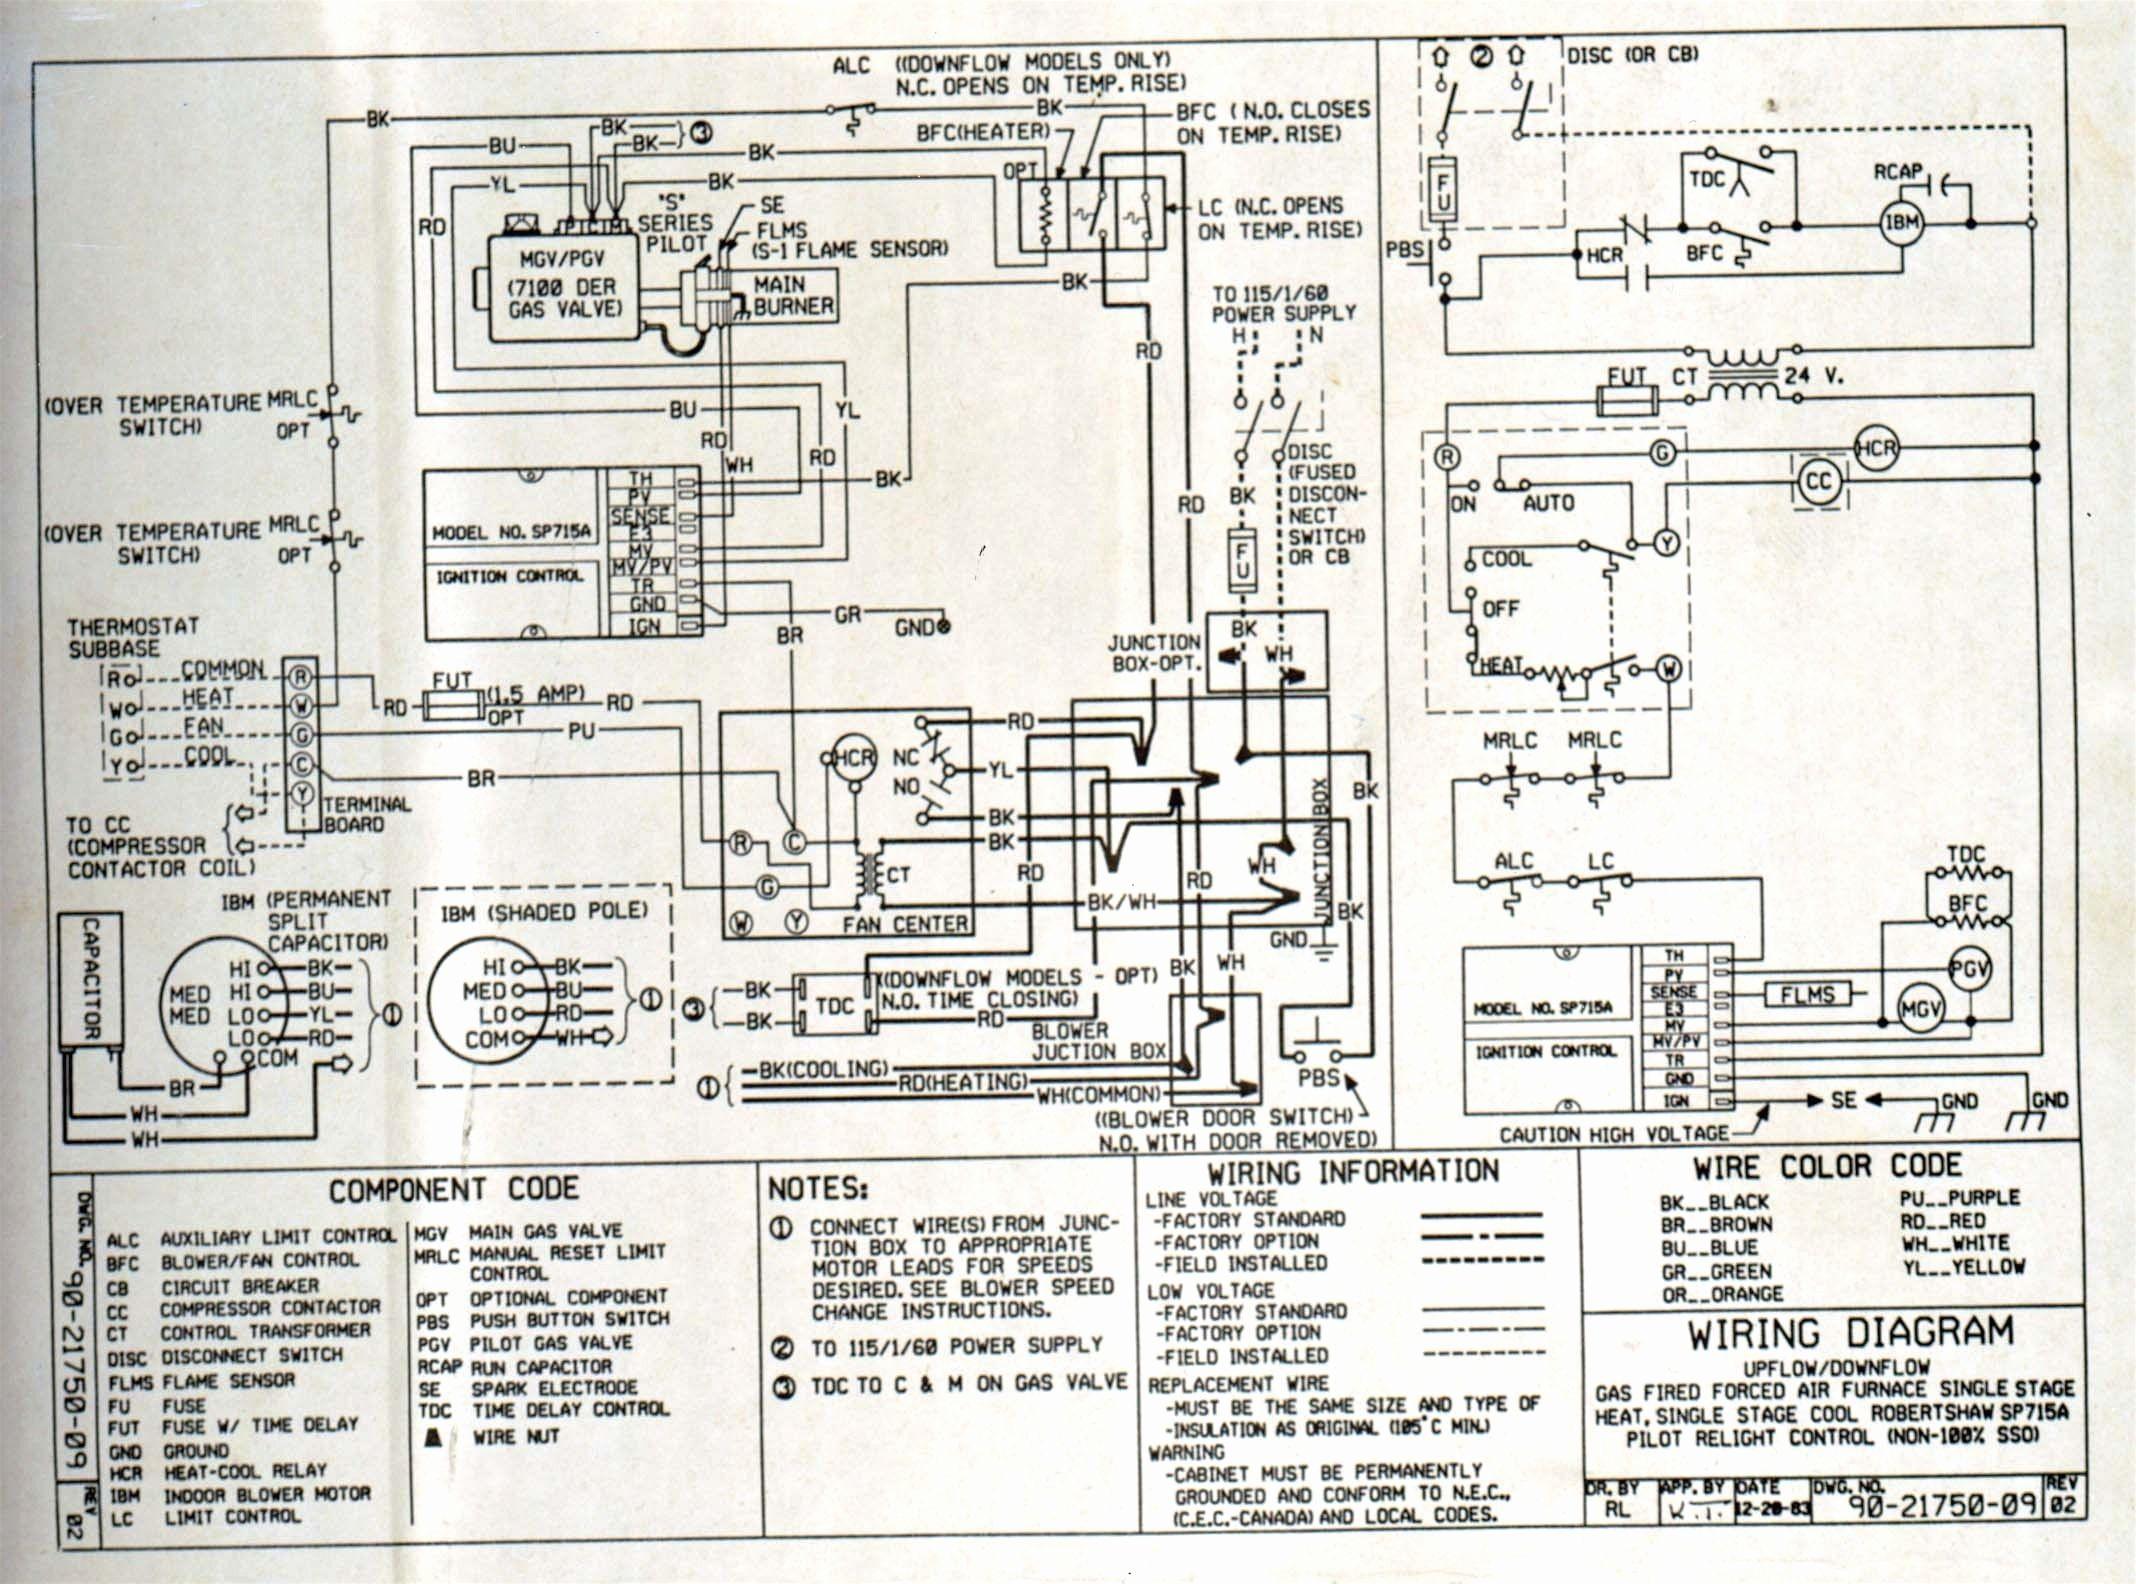 Wiring Diagram Relay Symbol Basics Of Time Delay Relays Tdrs - Time Delay Relay Wiring Diagram